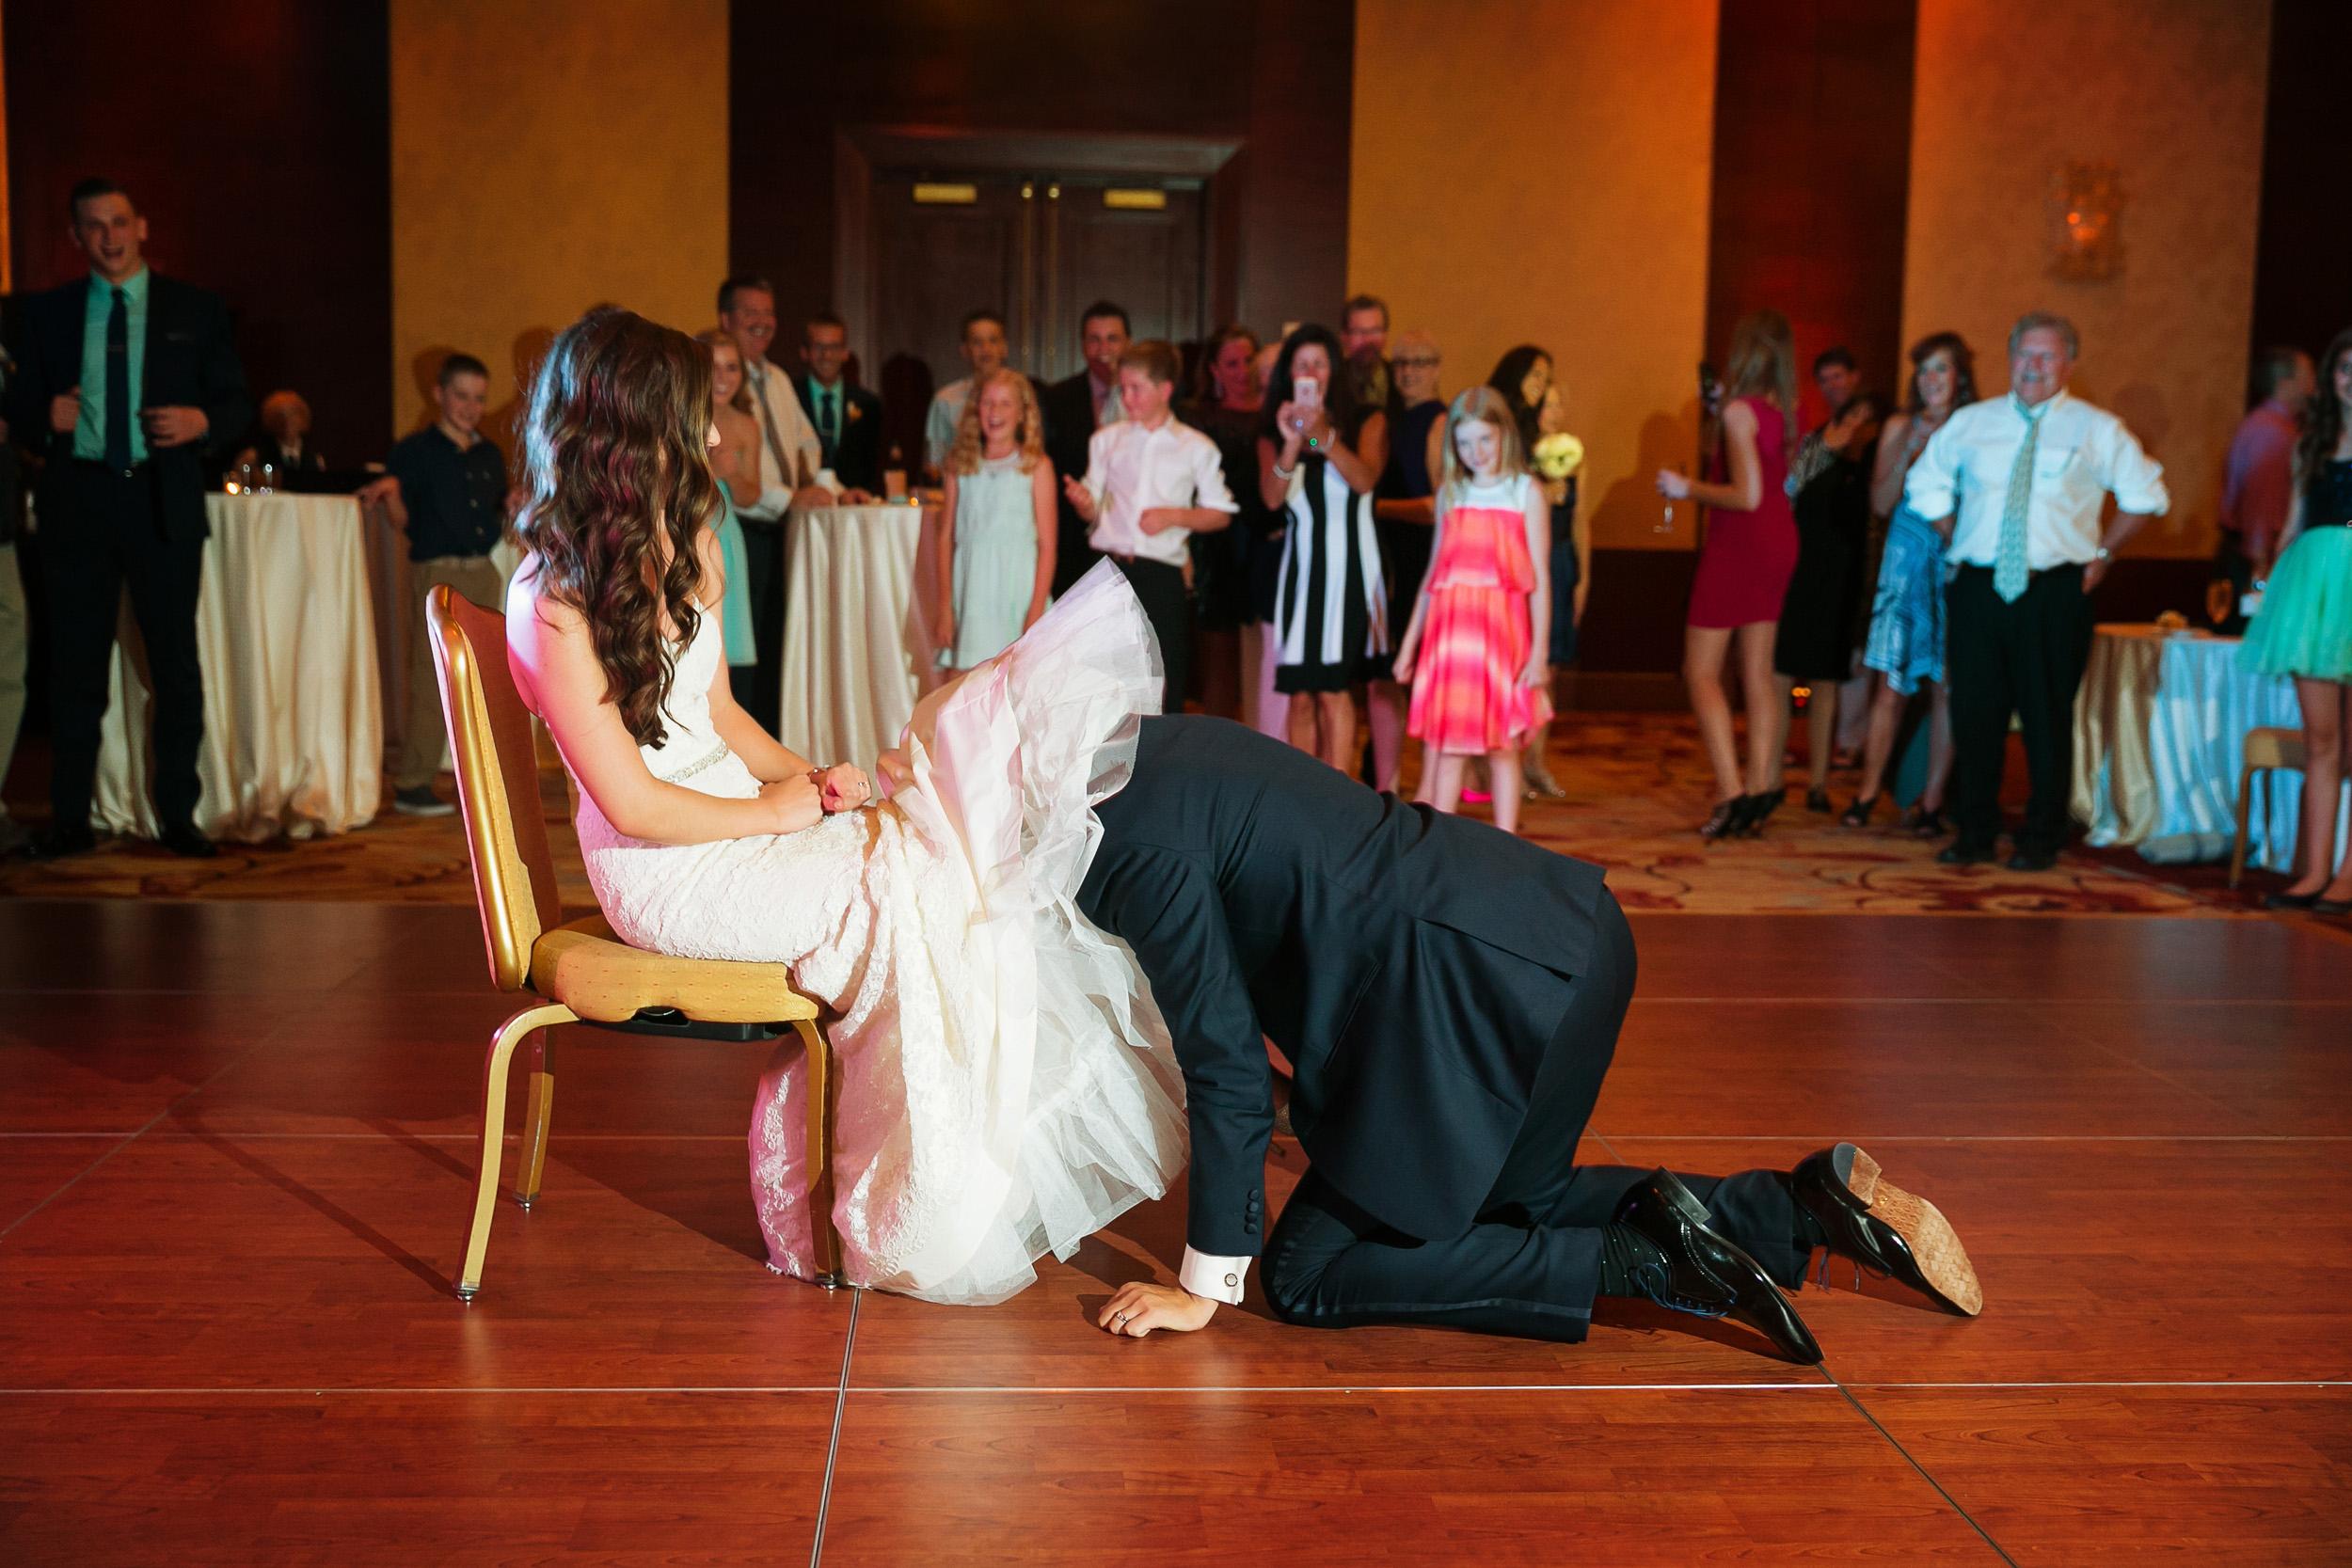 Wedding-In-Denver-Holy-Ghost-Church-030.jpg